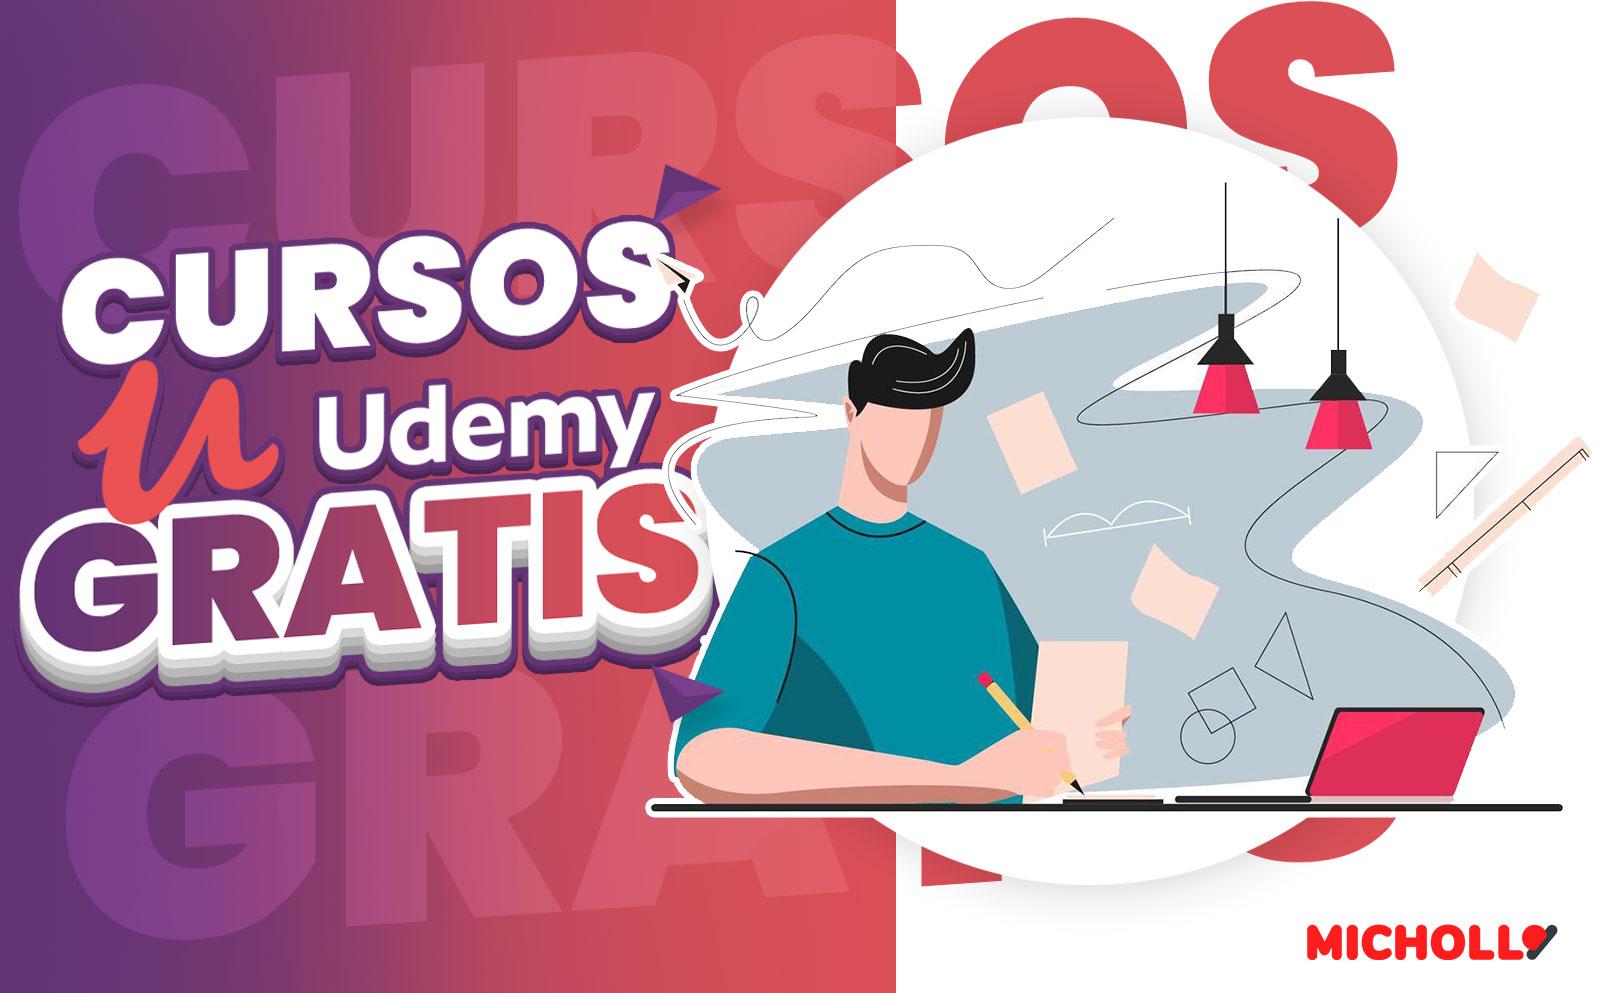 Cursos GRATIS de Programación, Bases de Datos, diseño gráfico, etc.